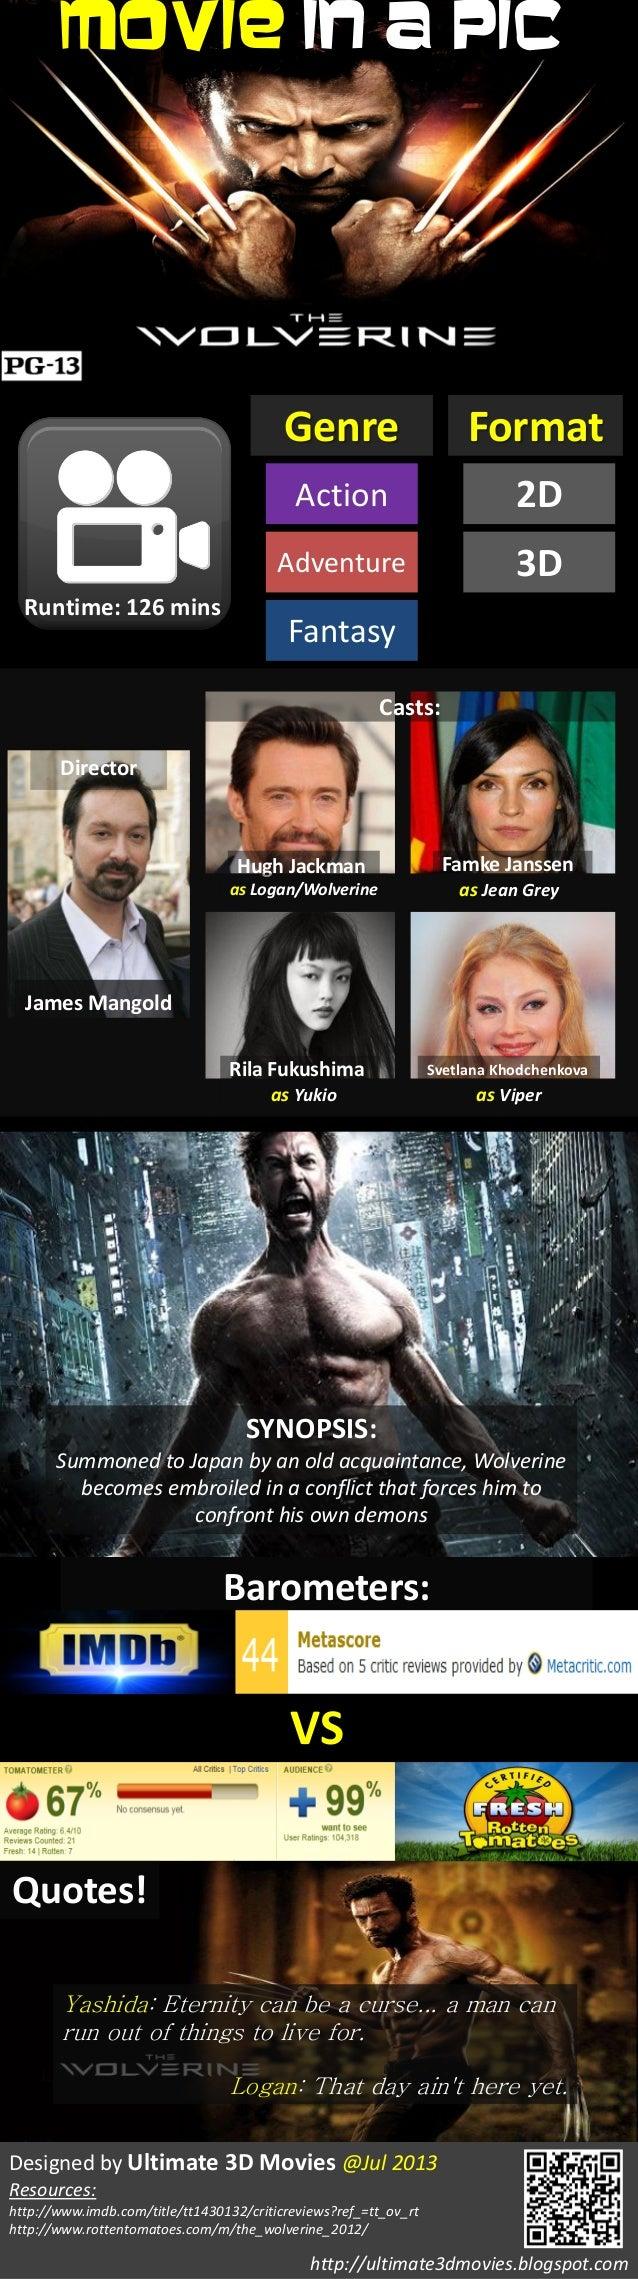 Movie In A Pic Genre Runtime: 126 mins Action Adventure Fantasy Format 2D 3D Director James Mangold Casts: Hugh Jackman Fa...